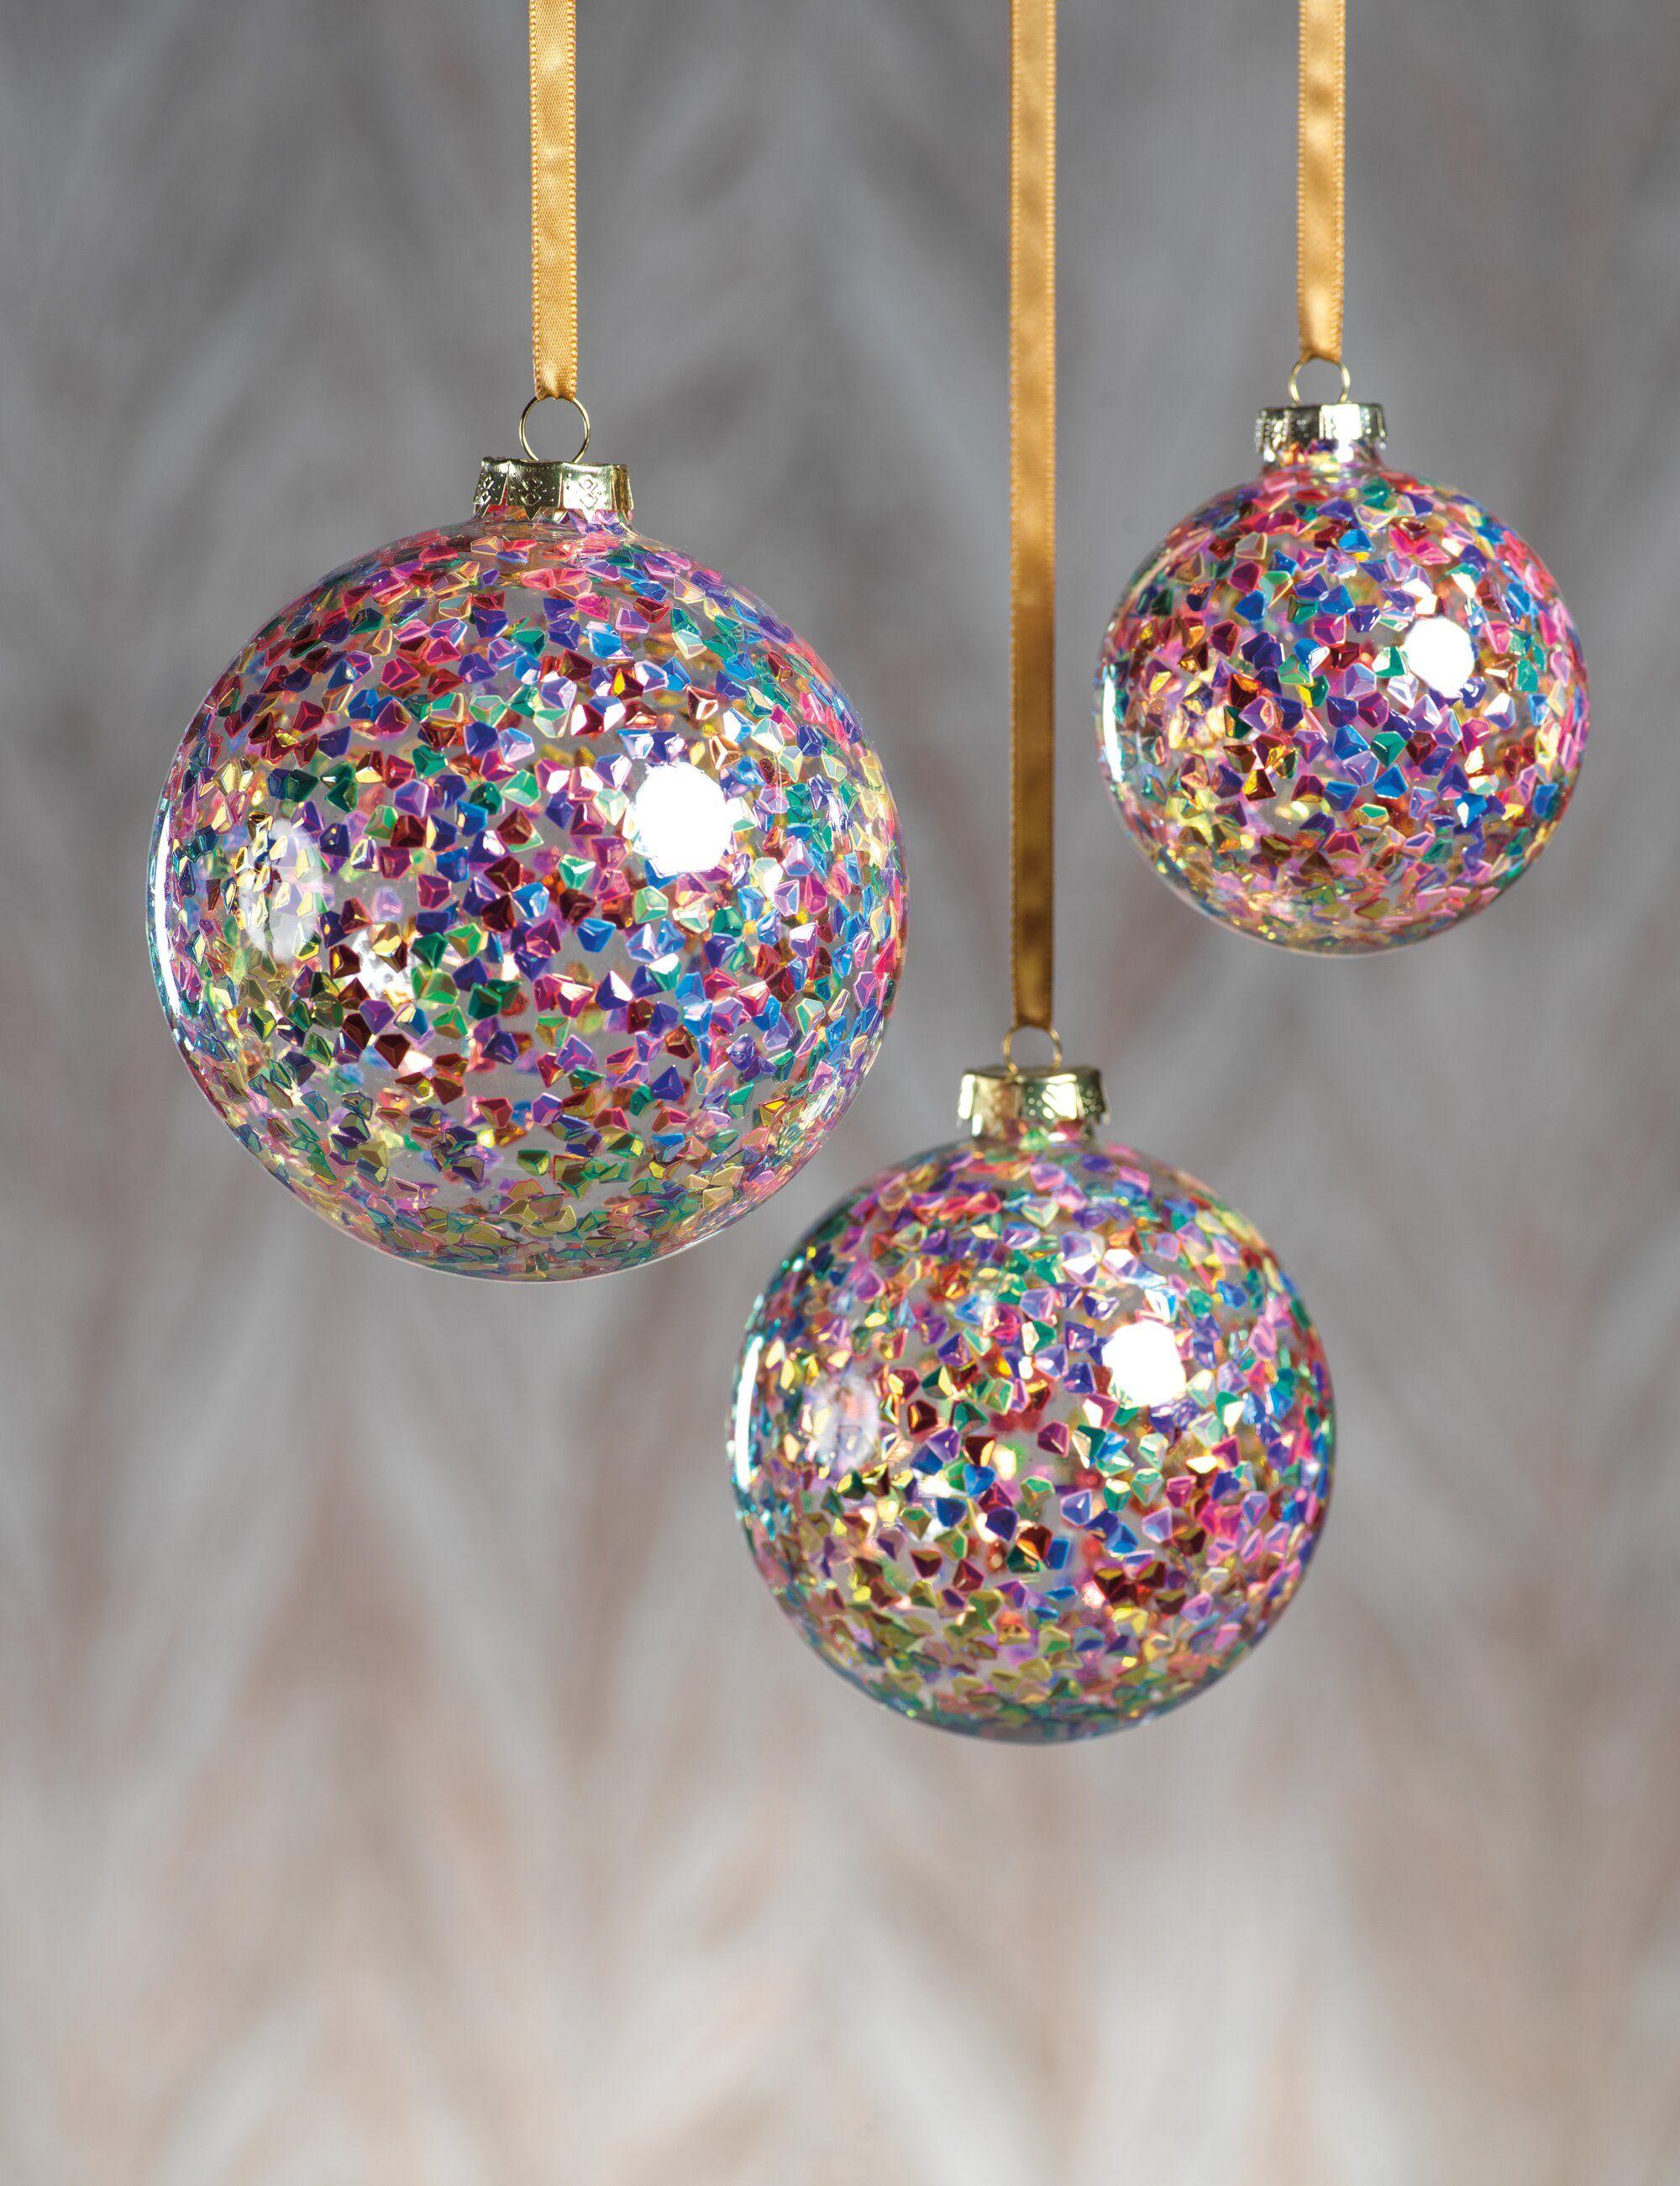 Pentagon Sequin Ball Ornament Pretty Christmas Ornaments Christmas Ball Ornaments Diy Clear Christmas Ornaments